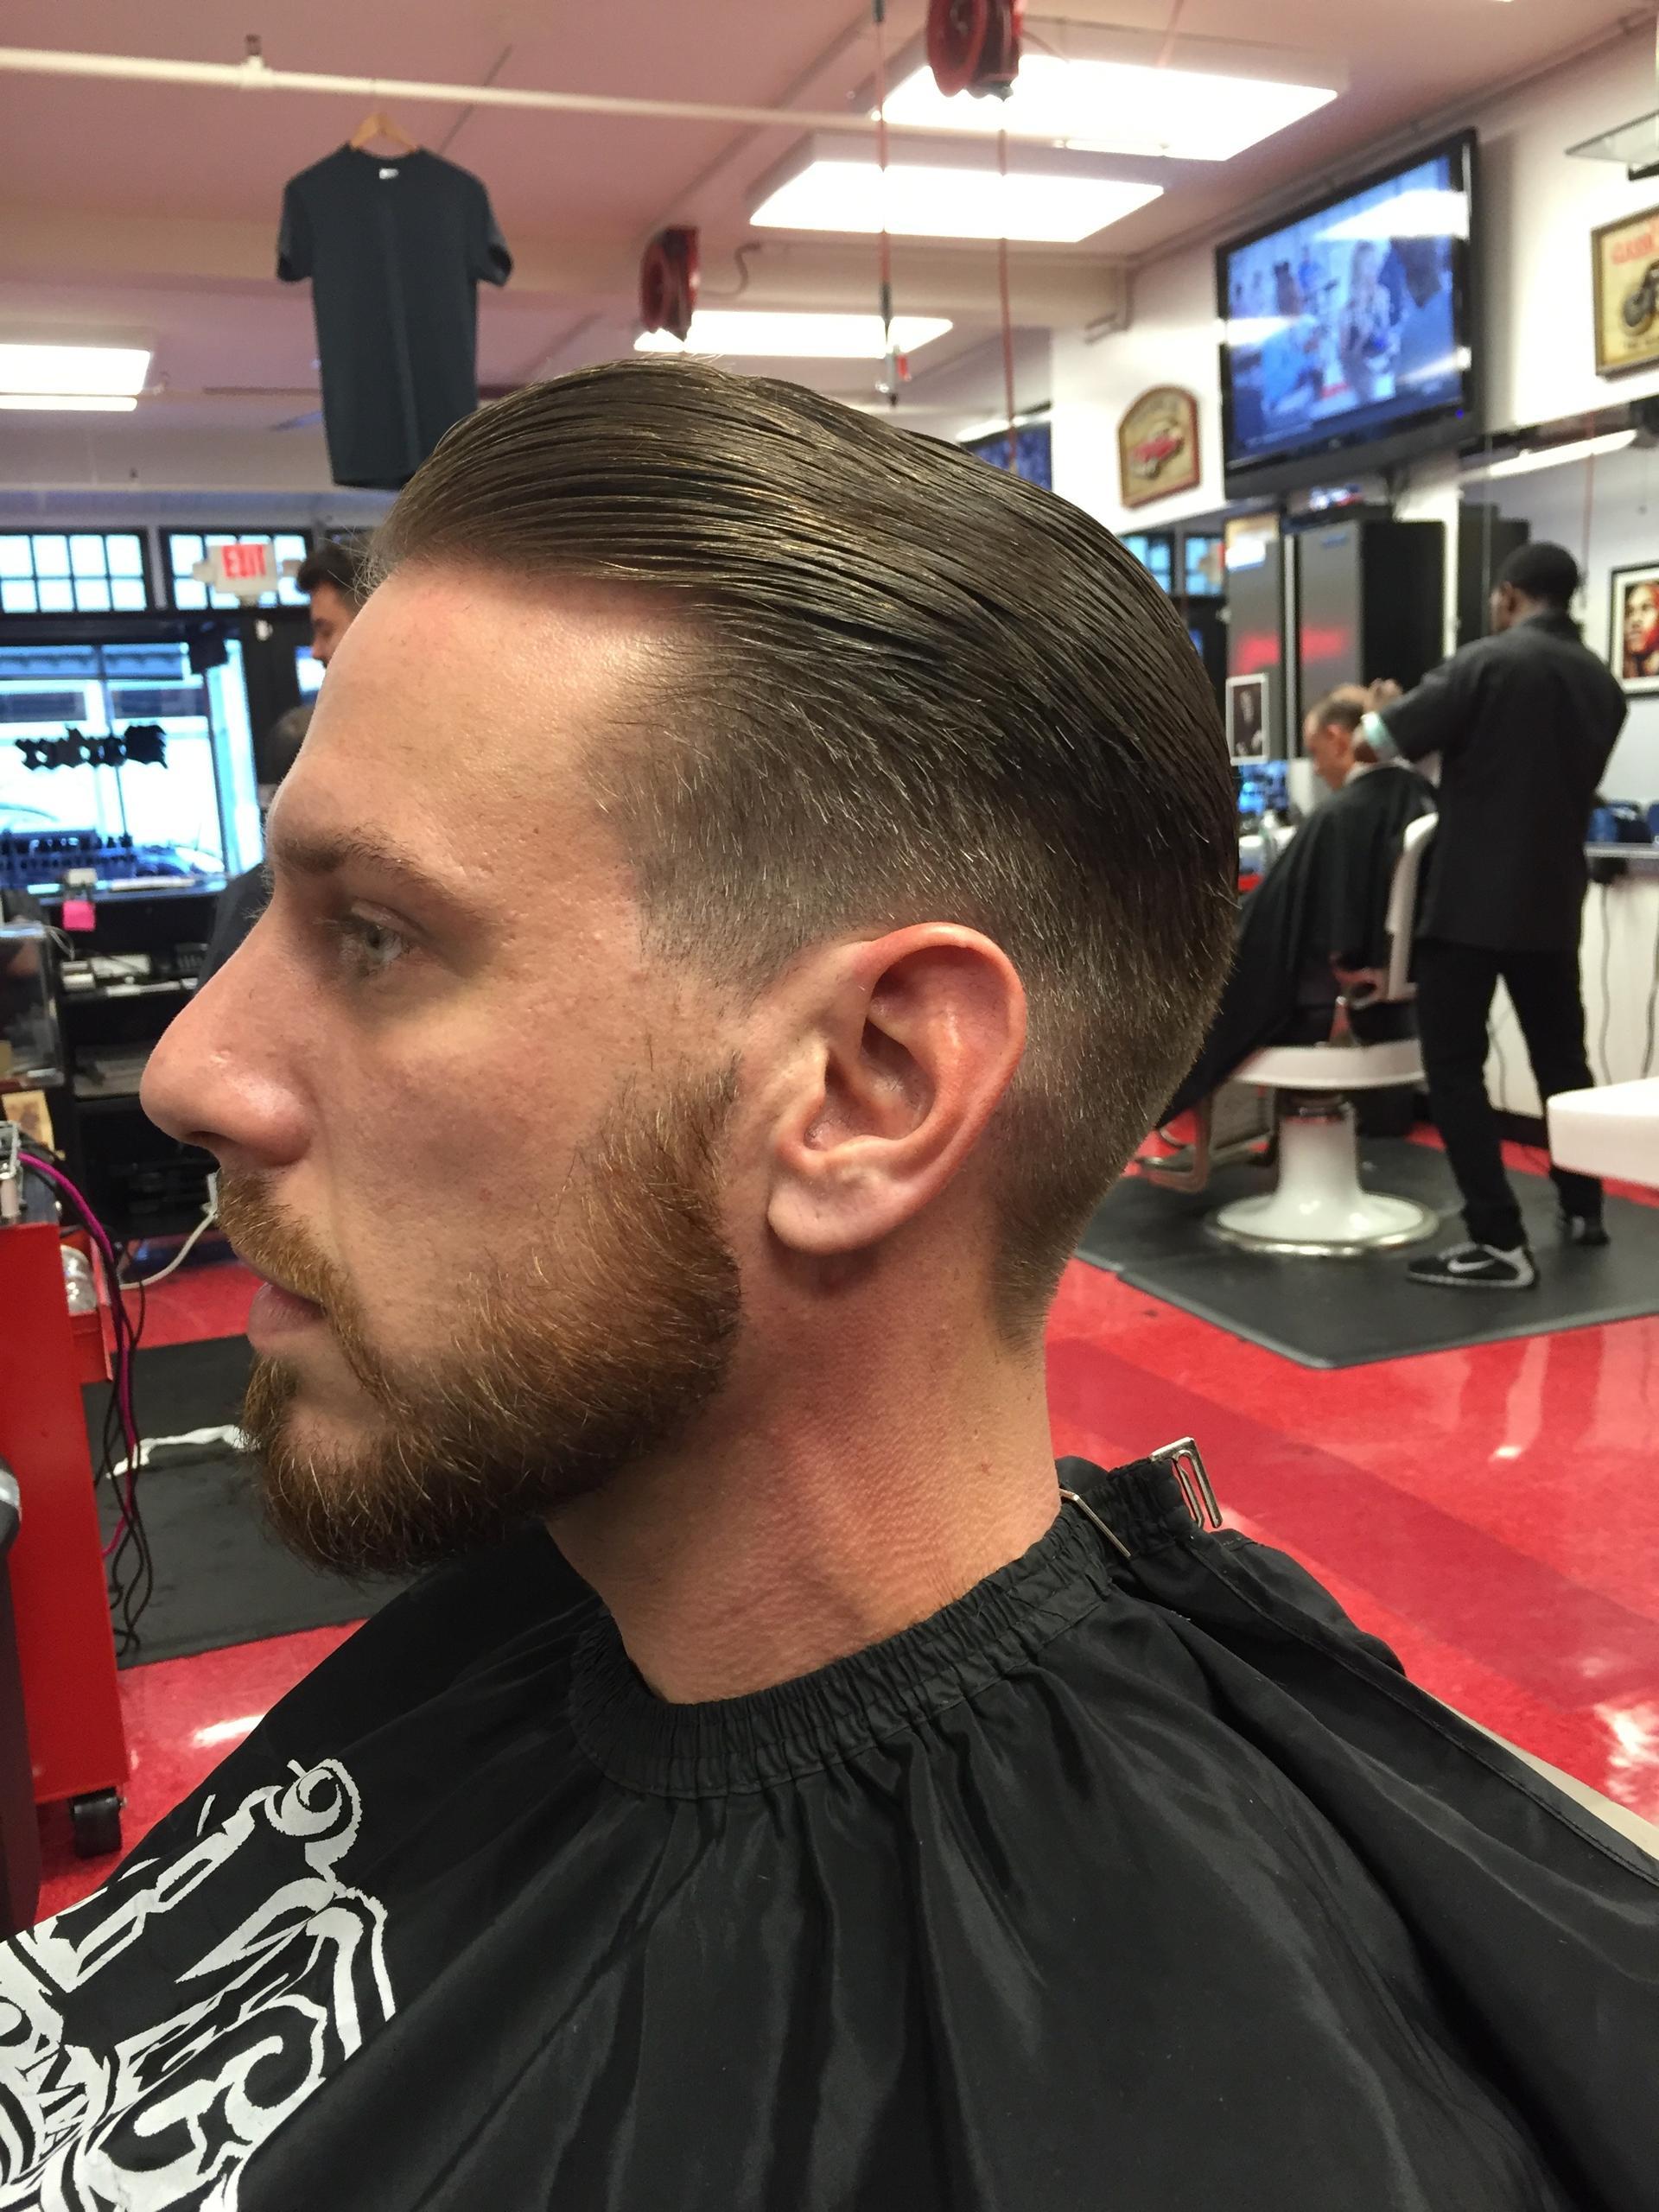 Gentlemen S Hair Cuts Cruisin Style Barber Parlor